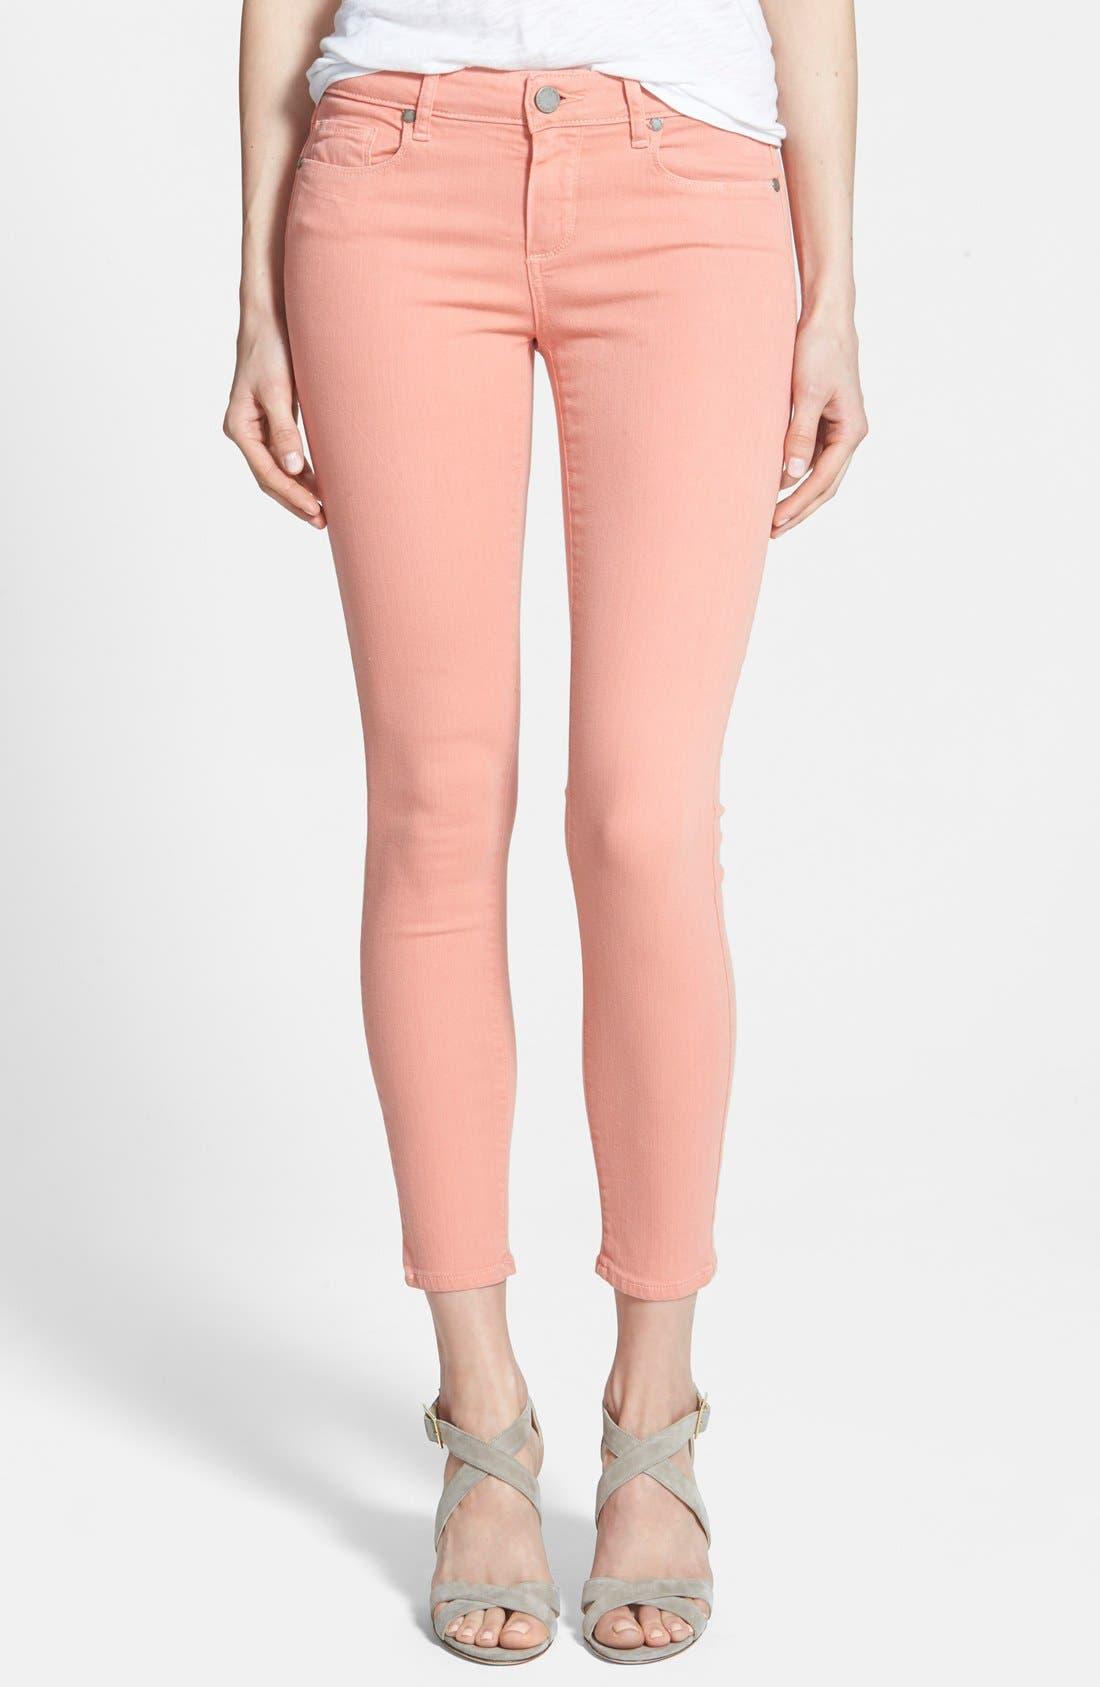 Alternate Image 1 Selected - Paige Denim 'Verdugo' Ankle Super Skinny Jeans (Desert Sunset)